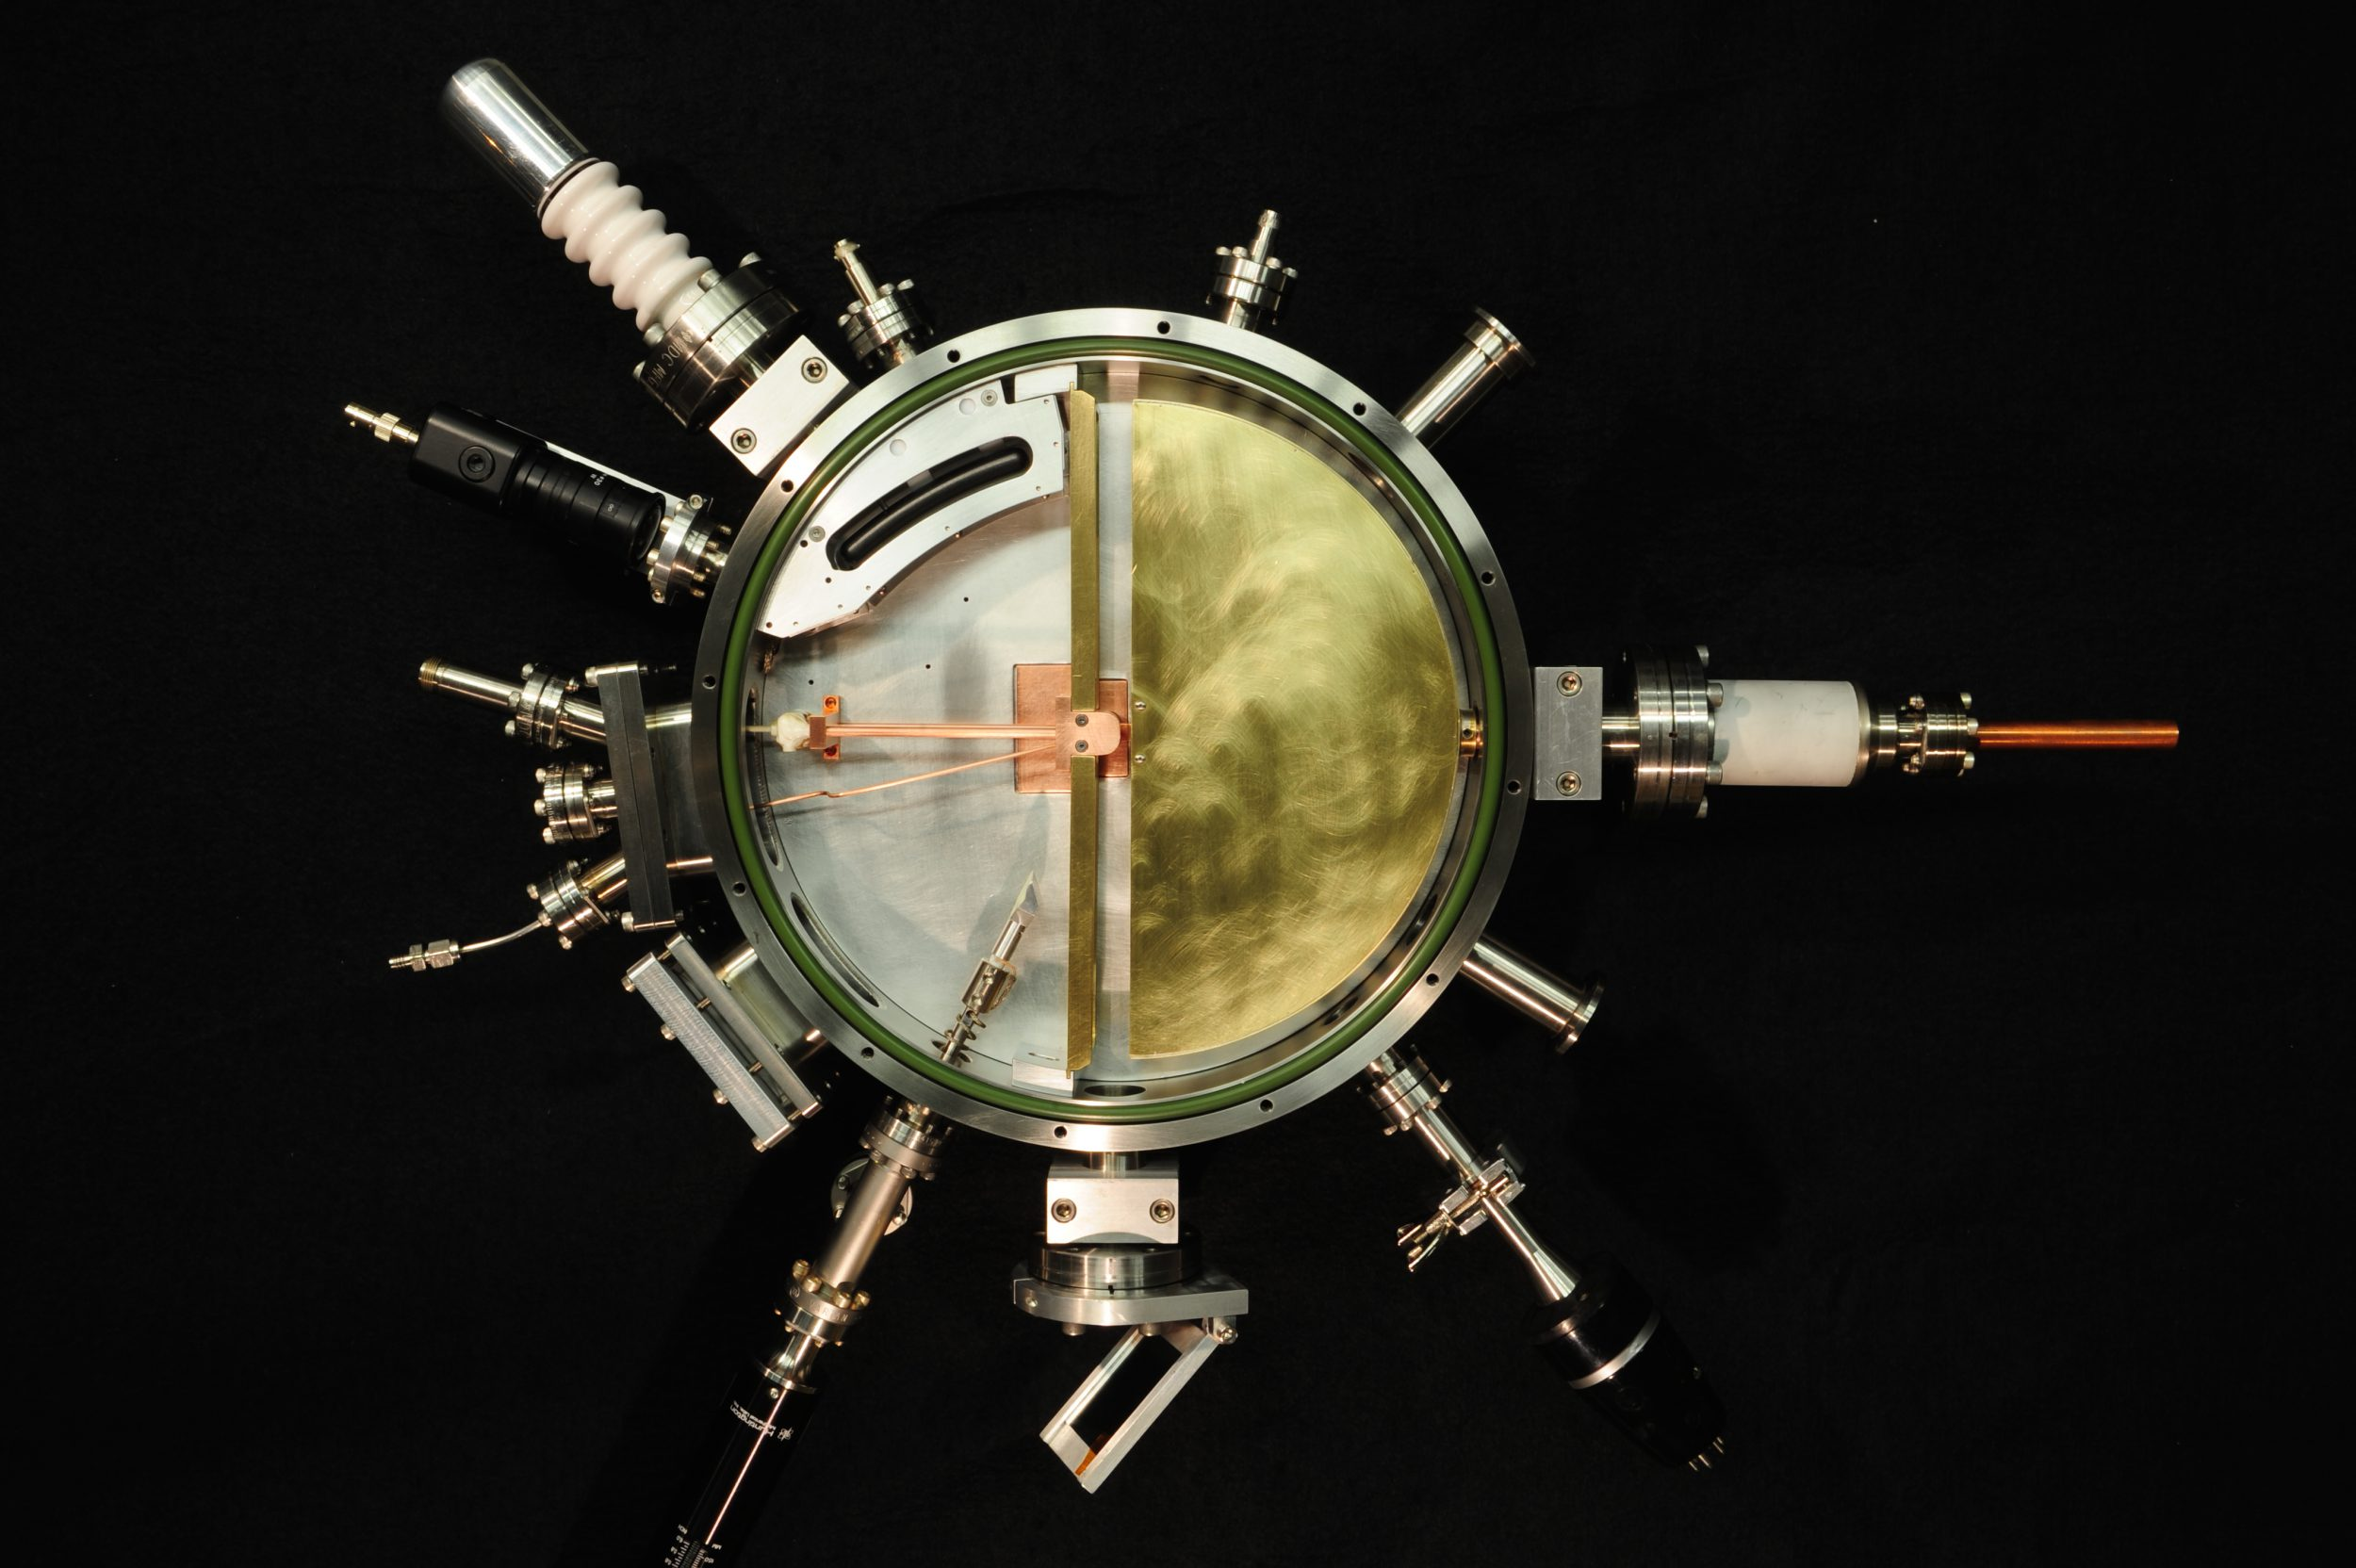 12-Inch Cyclotron